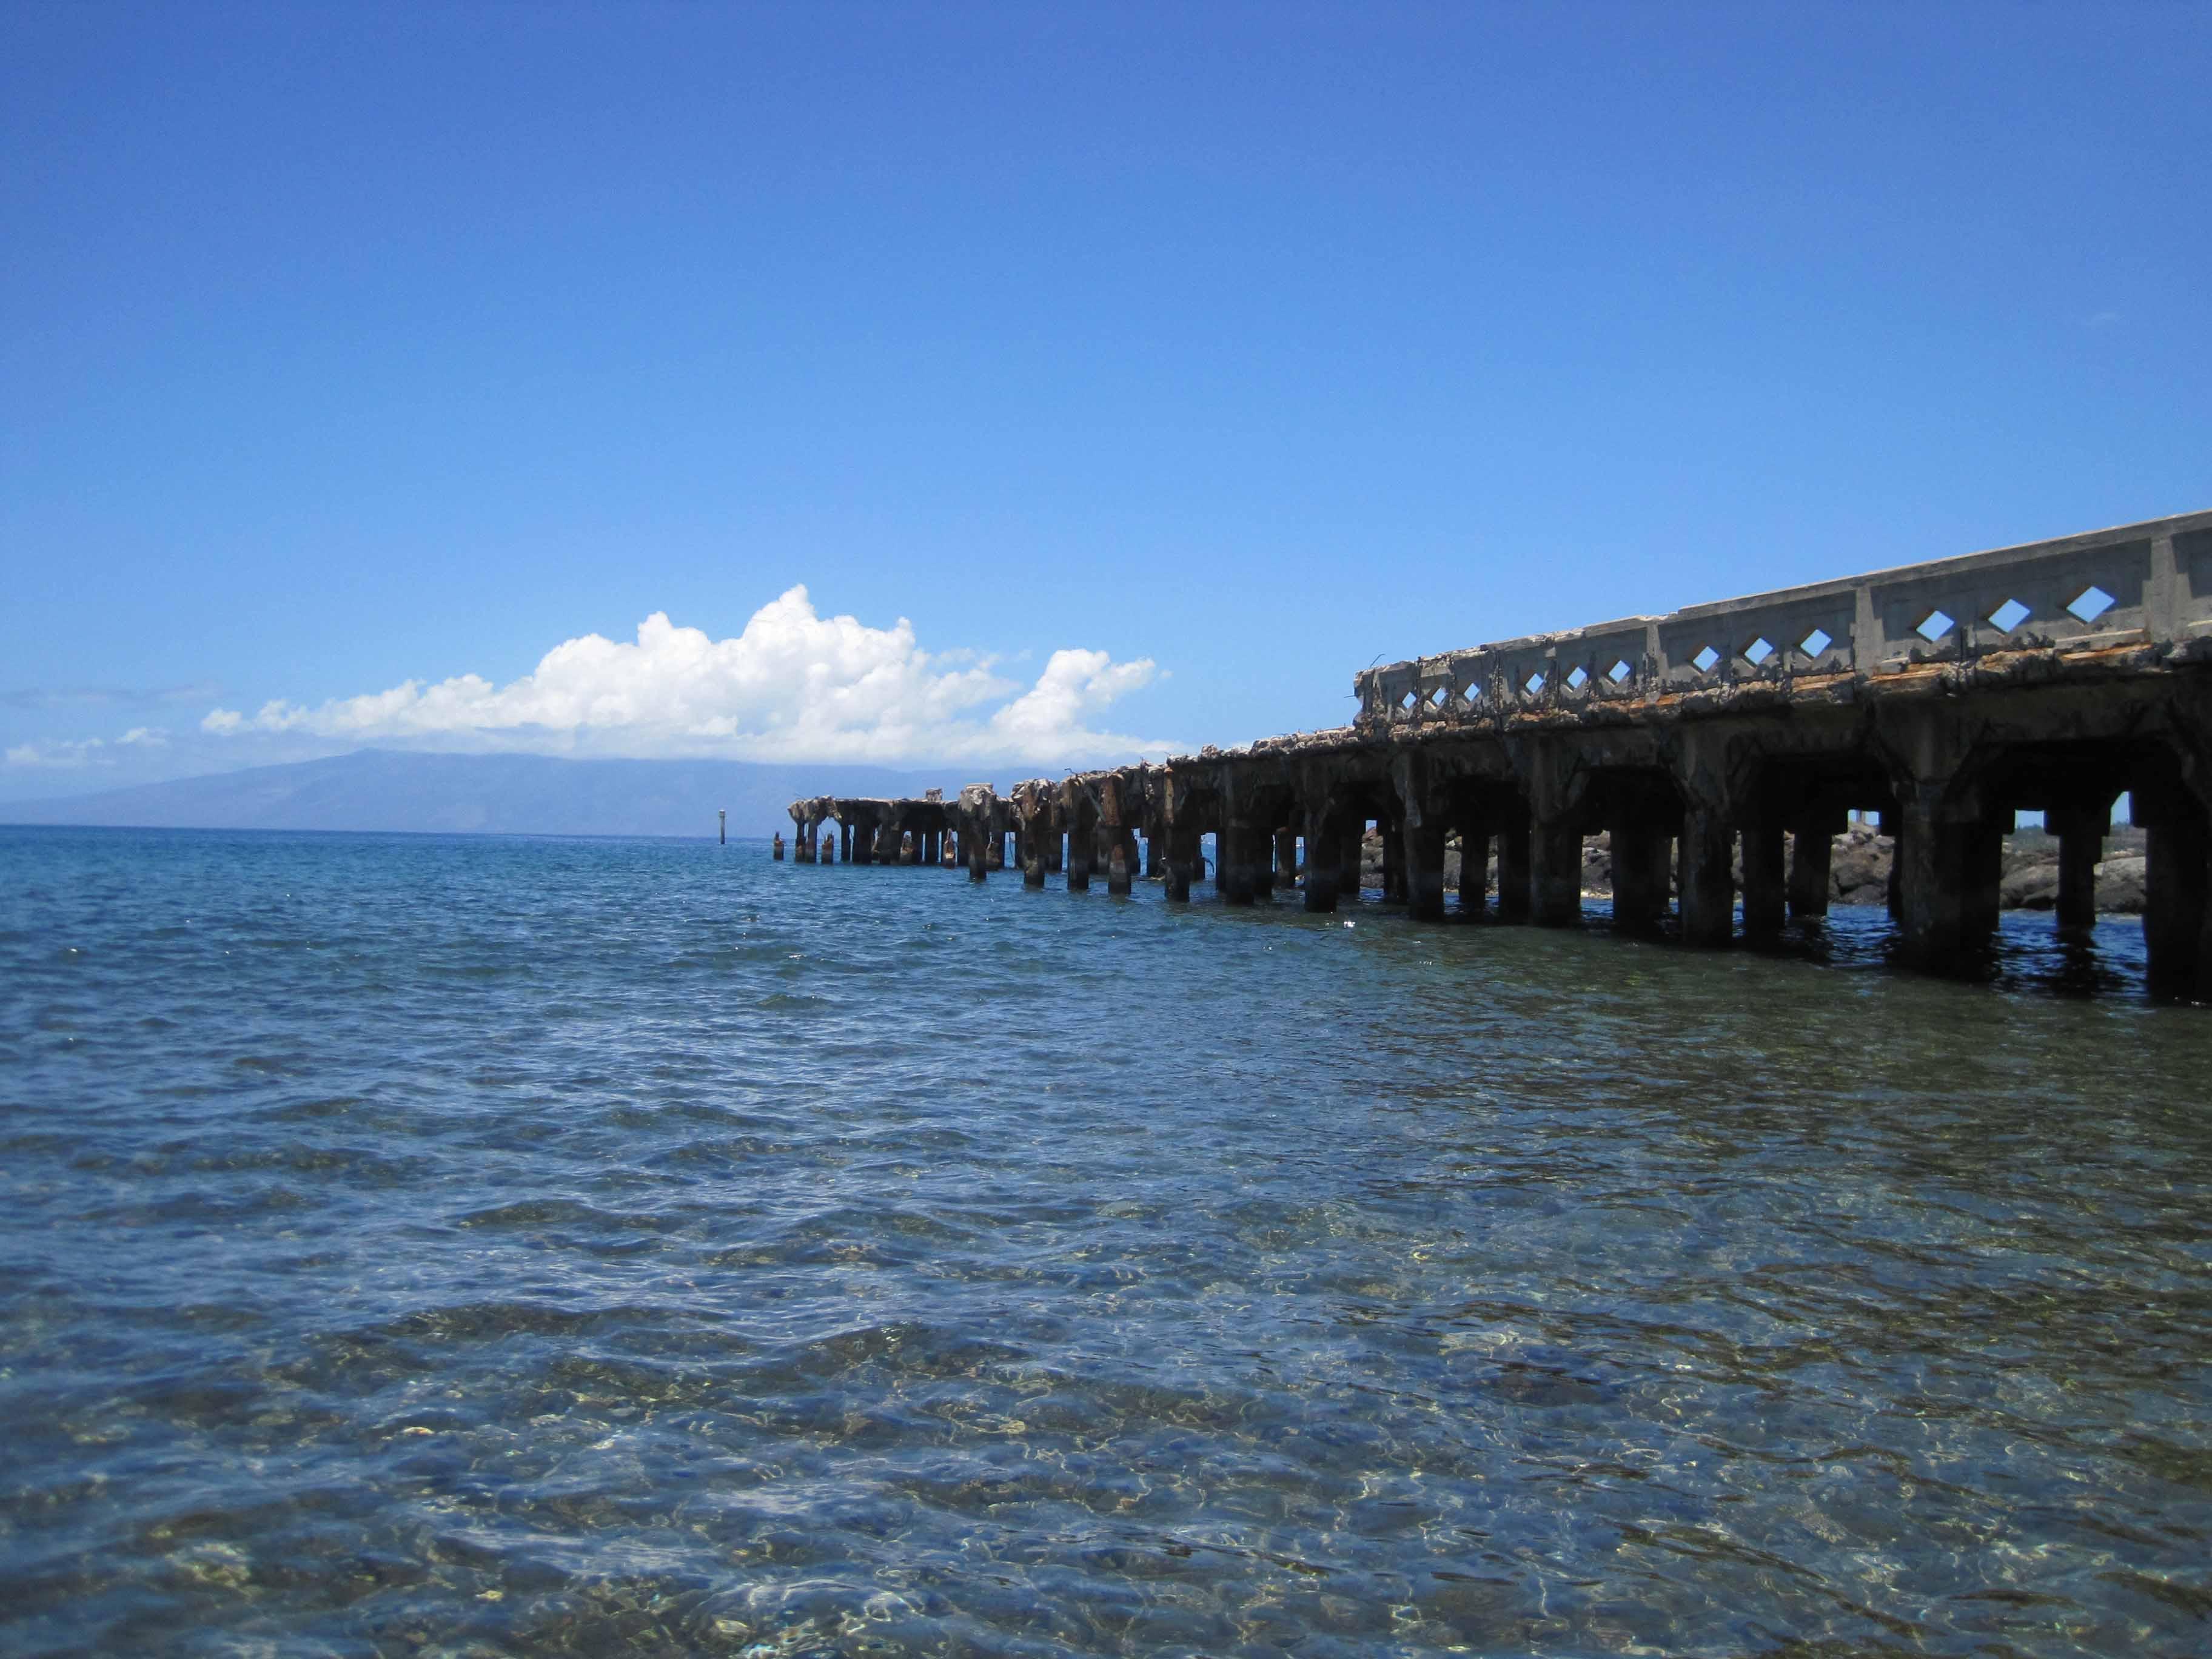 Scuba Diving Lahaina Maui Mala Wharf